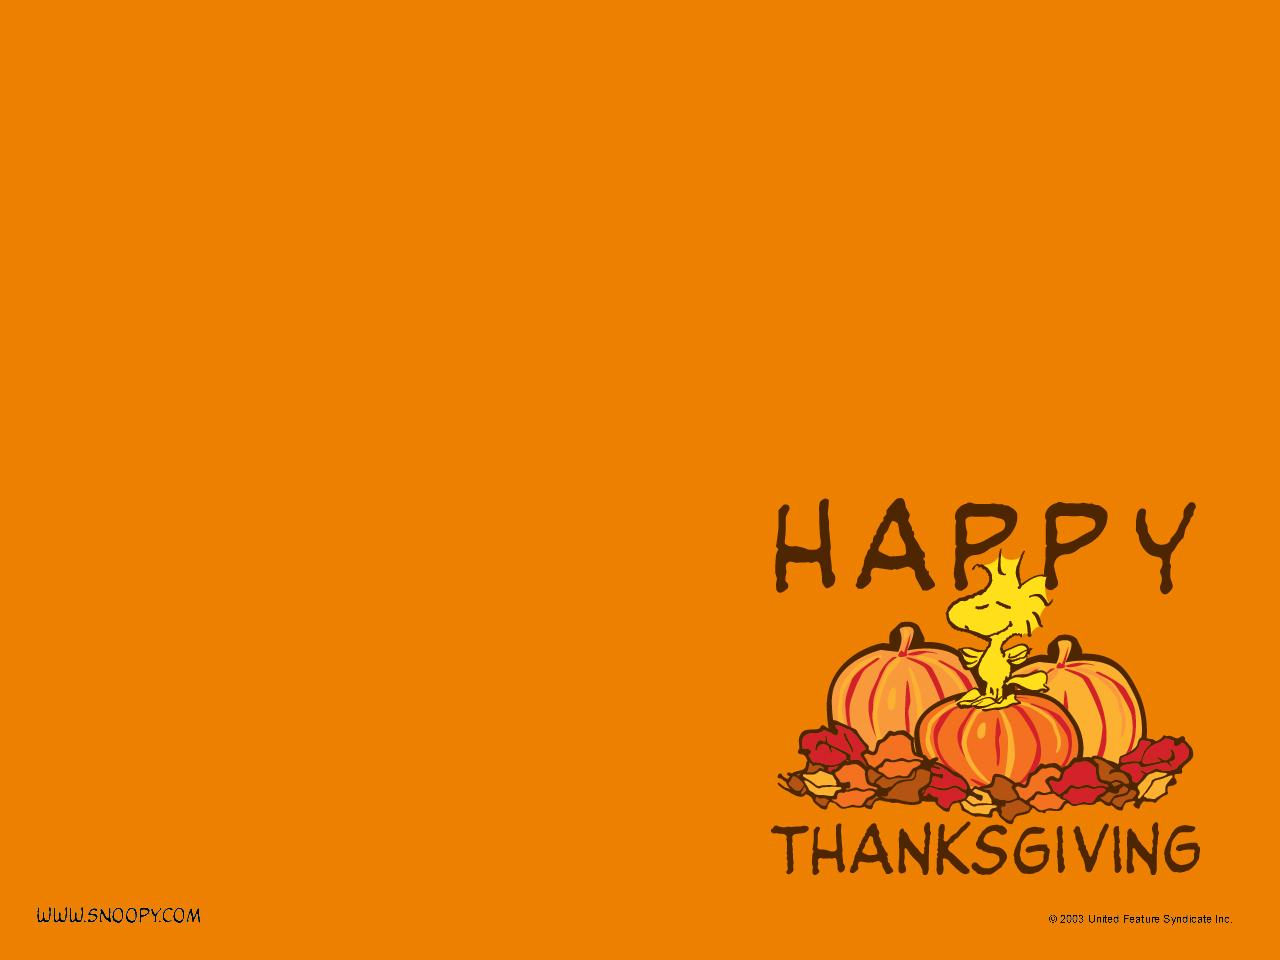 Snoopy Thanksgiving Wallpaper Hd